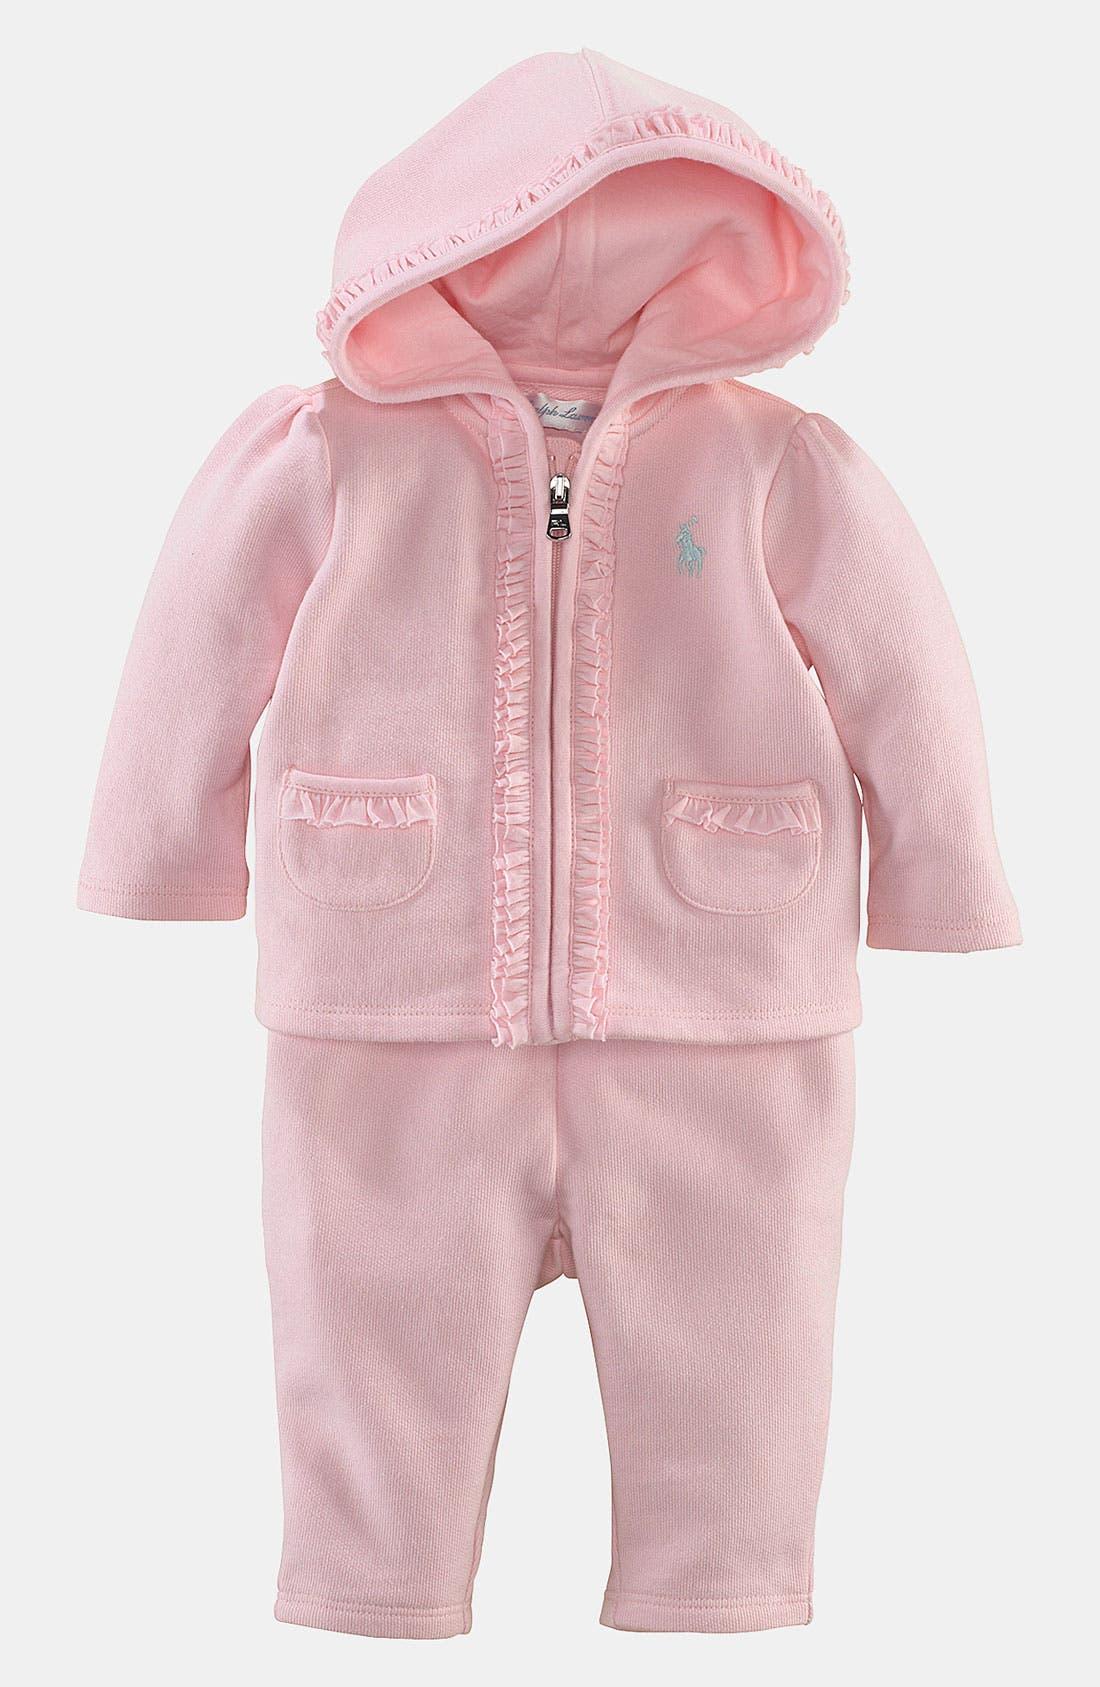 Main Image - Ralph Lauren Hoodie & Pants (Infant)